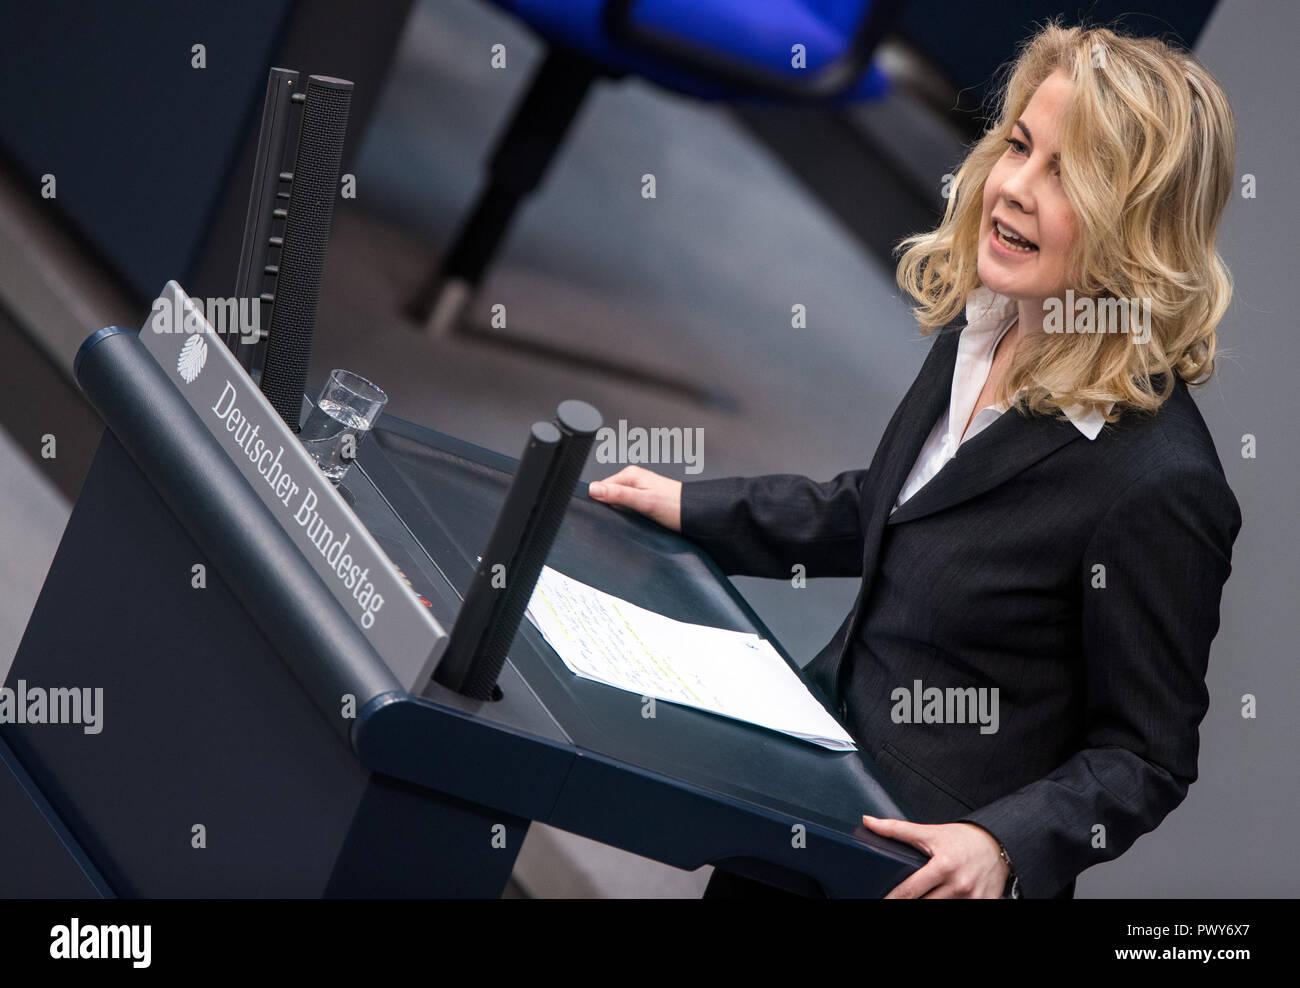 Berlin, Germany. 18th Oct, 2018. Linda Teutenberg, member of the Bundestag of the FDP faction, speaks in the Bundestag. Credit: Jens Büttner/dpa-Zentralbild/dpa/Alamy Live News - Stock Image